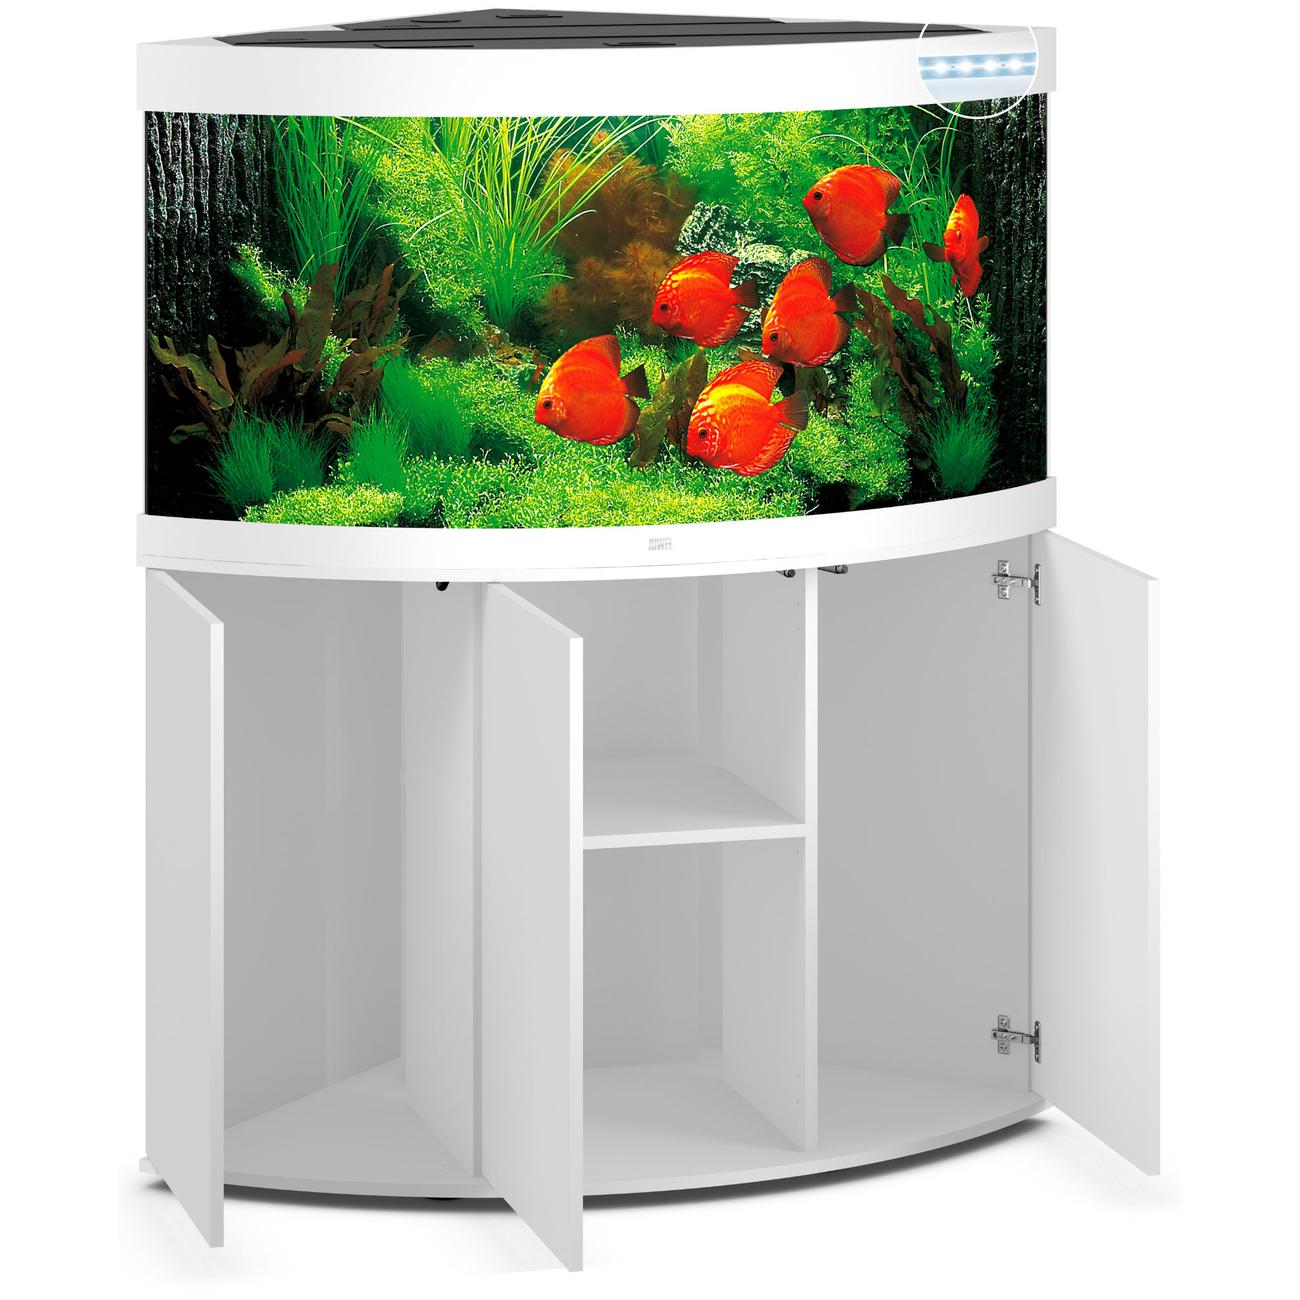 Juwel Trigon 350 LED Eck-Aquarium mit Unterschrank, Bild 8